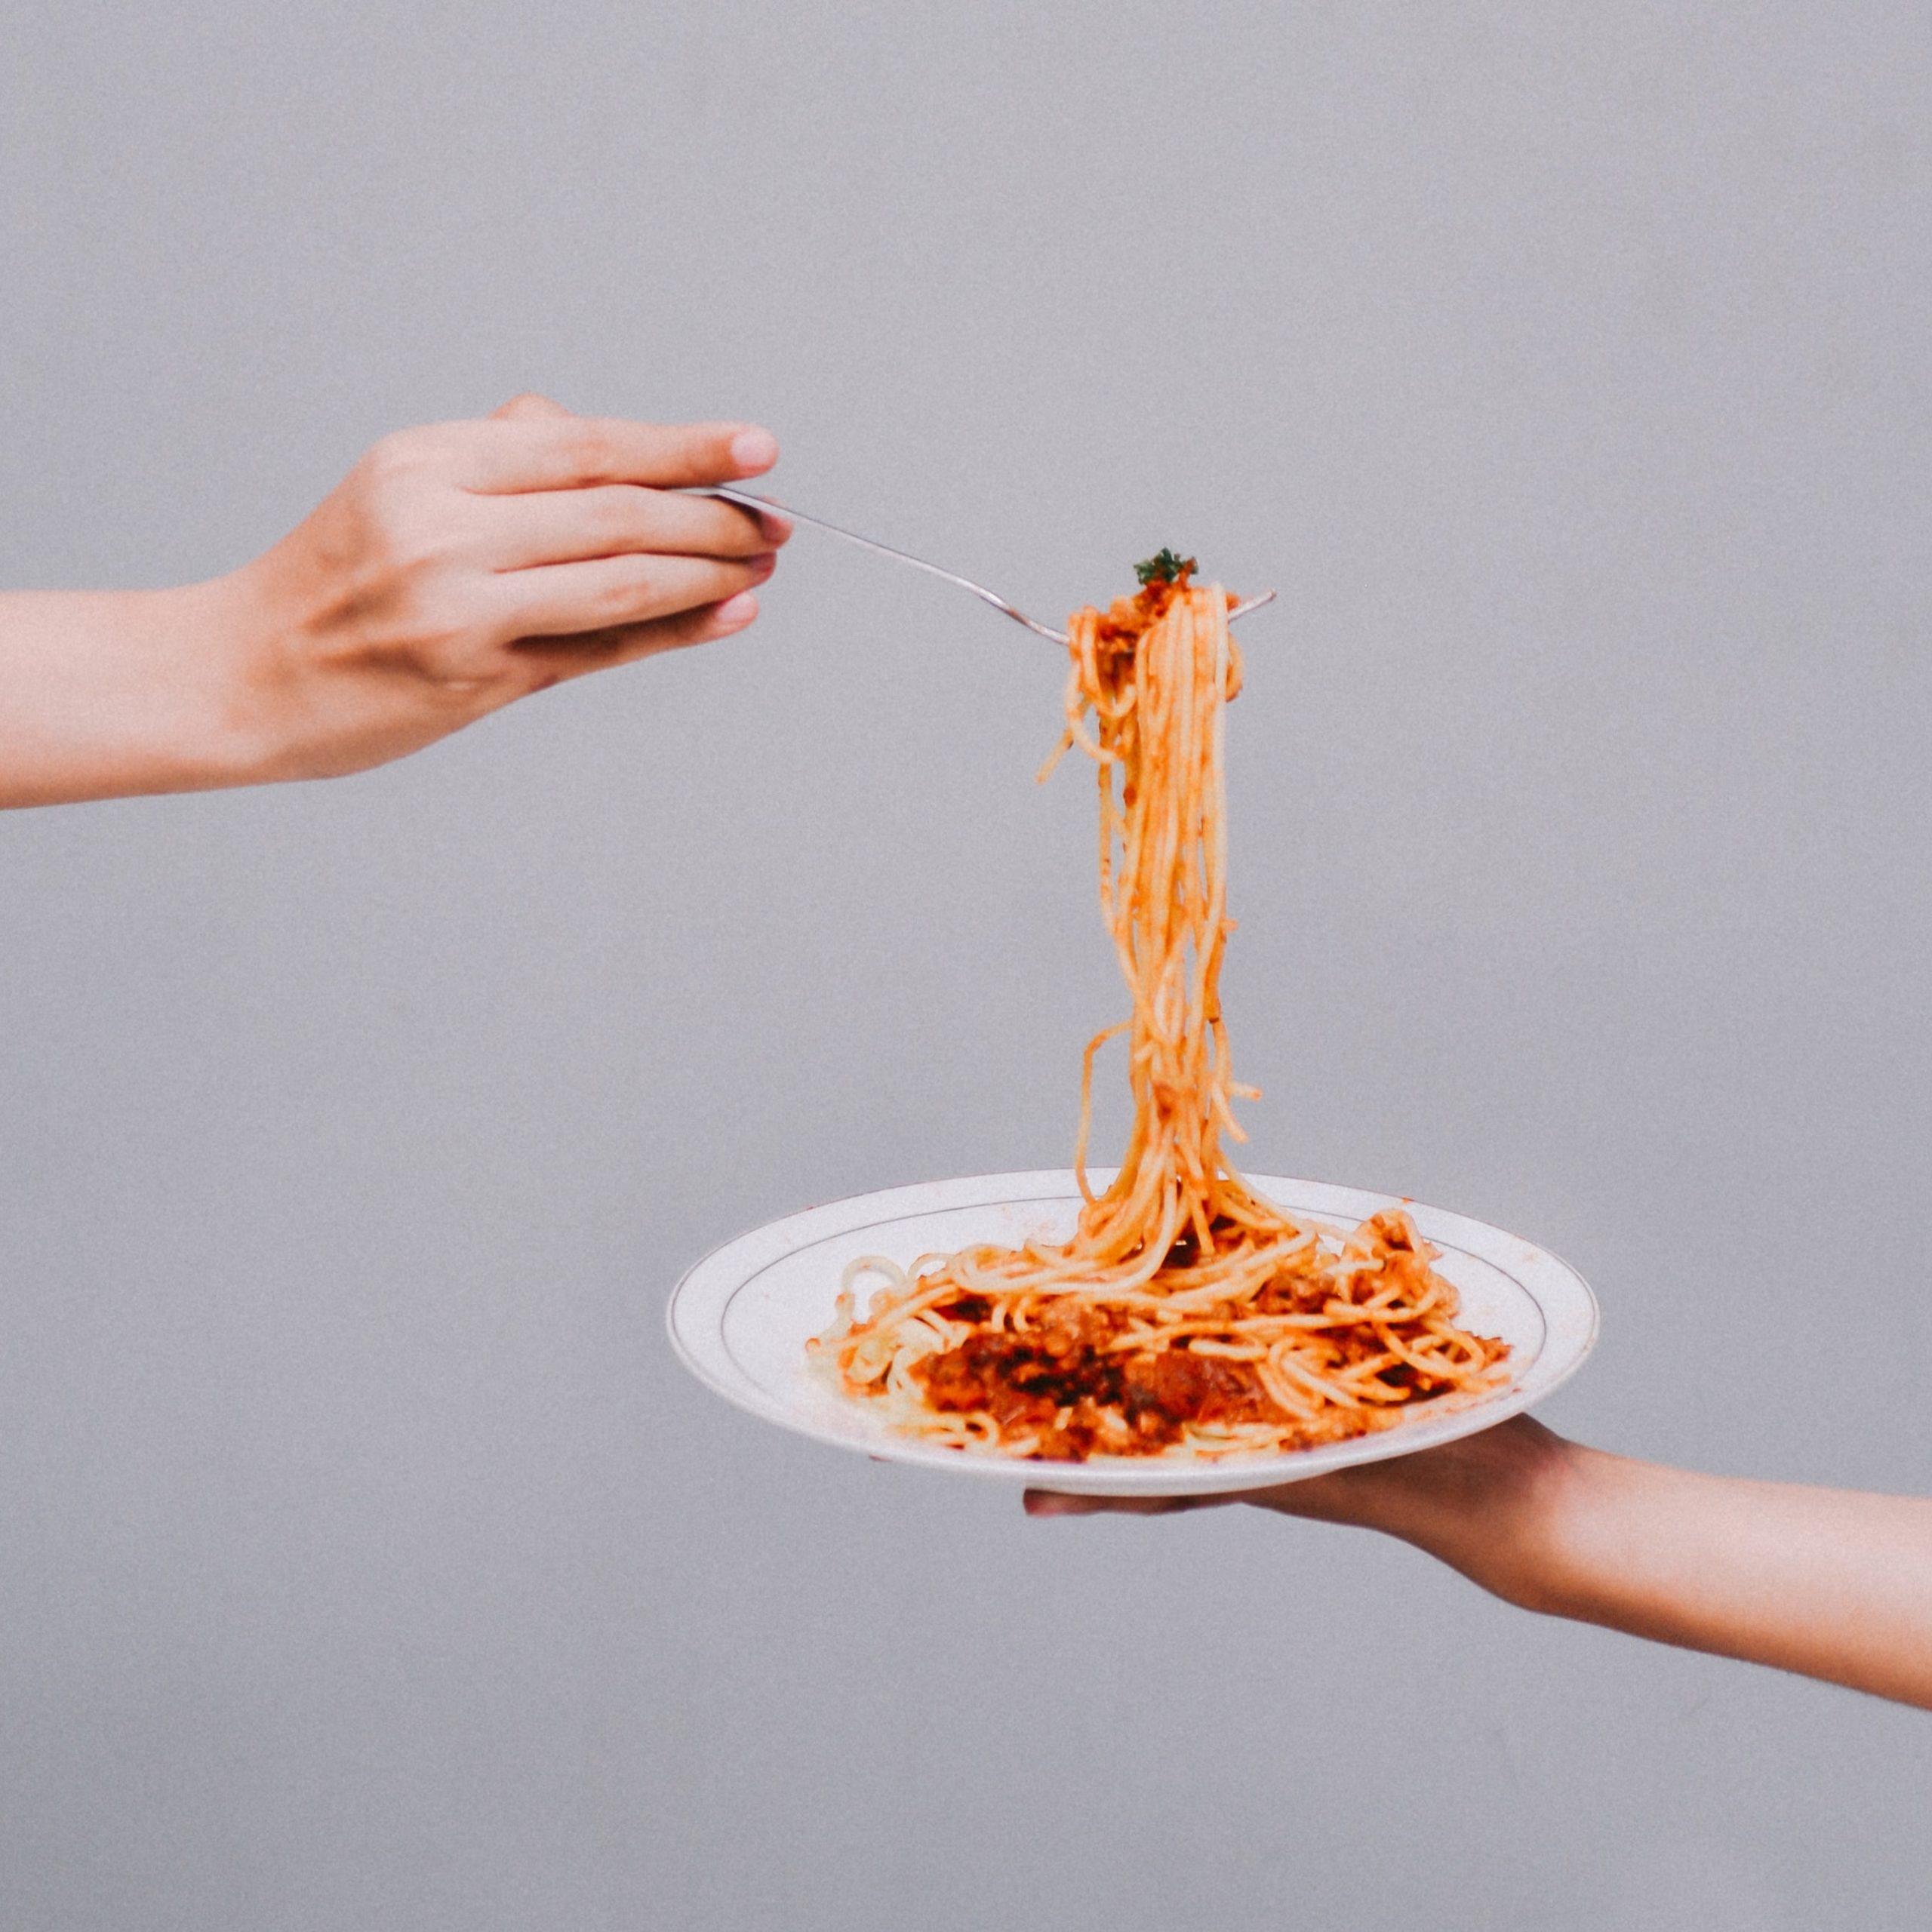 noodles in sauce